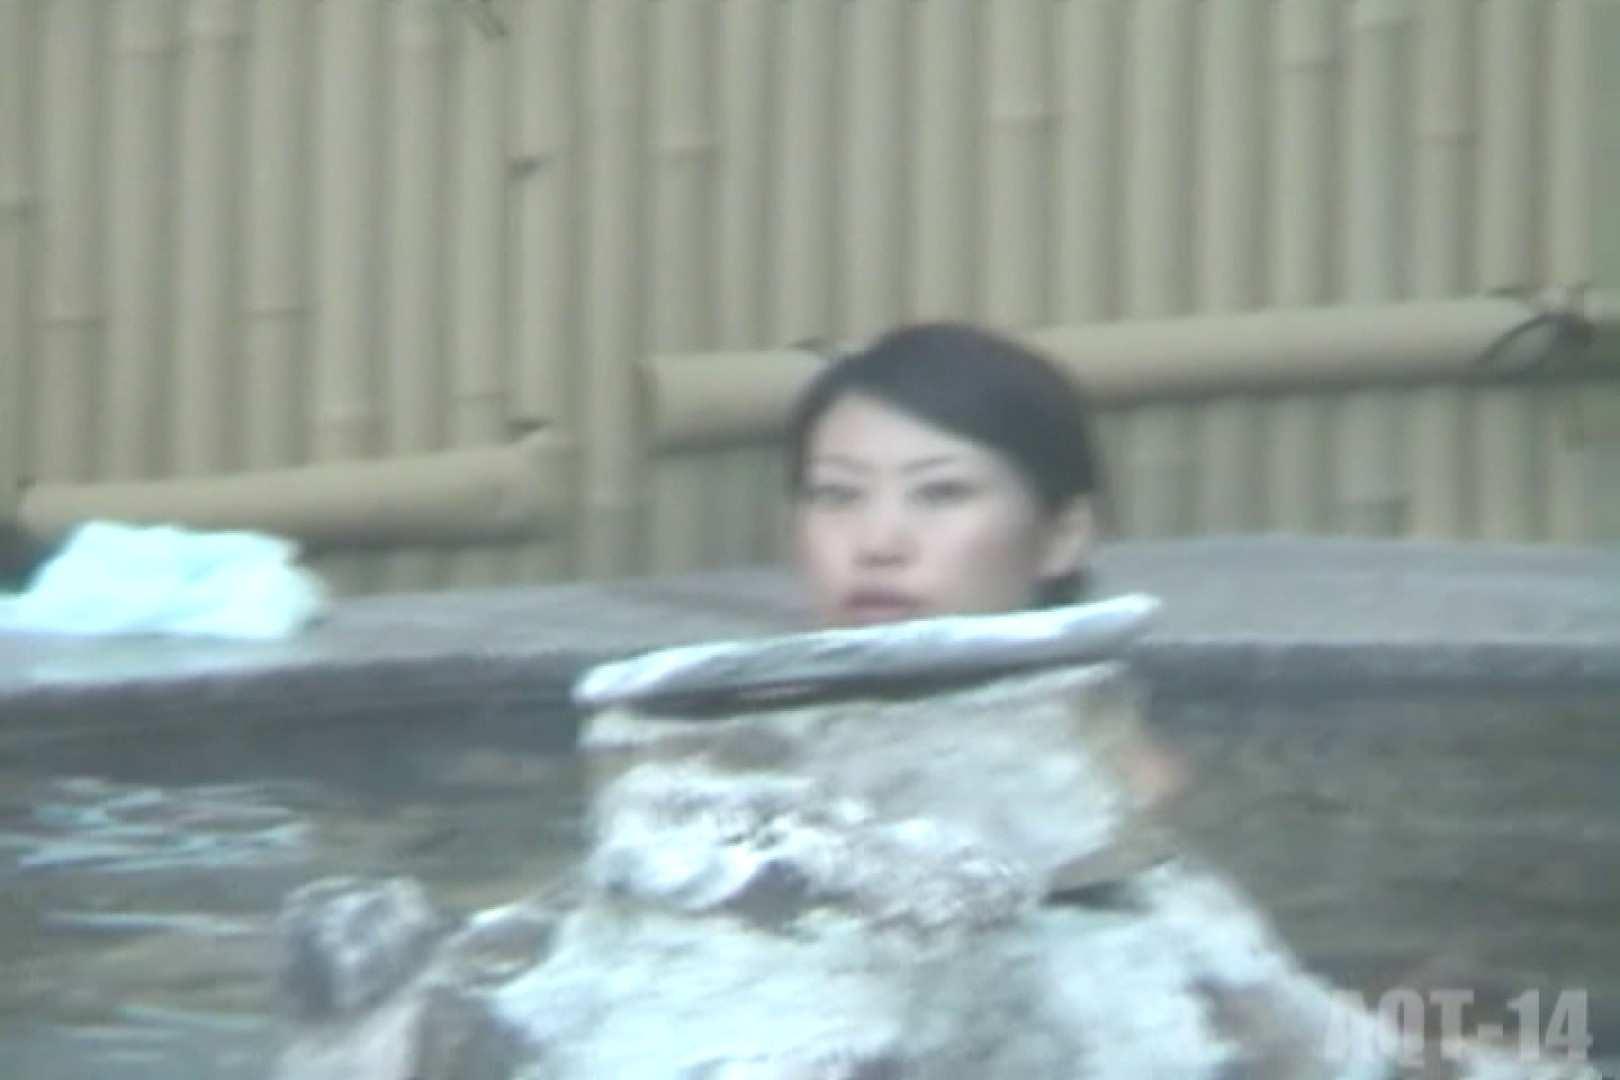 Aquaな露天風呂Vol.820 盗撮師作品  104pic 3